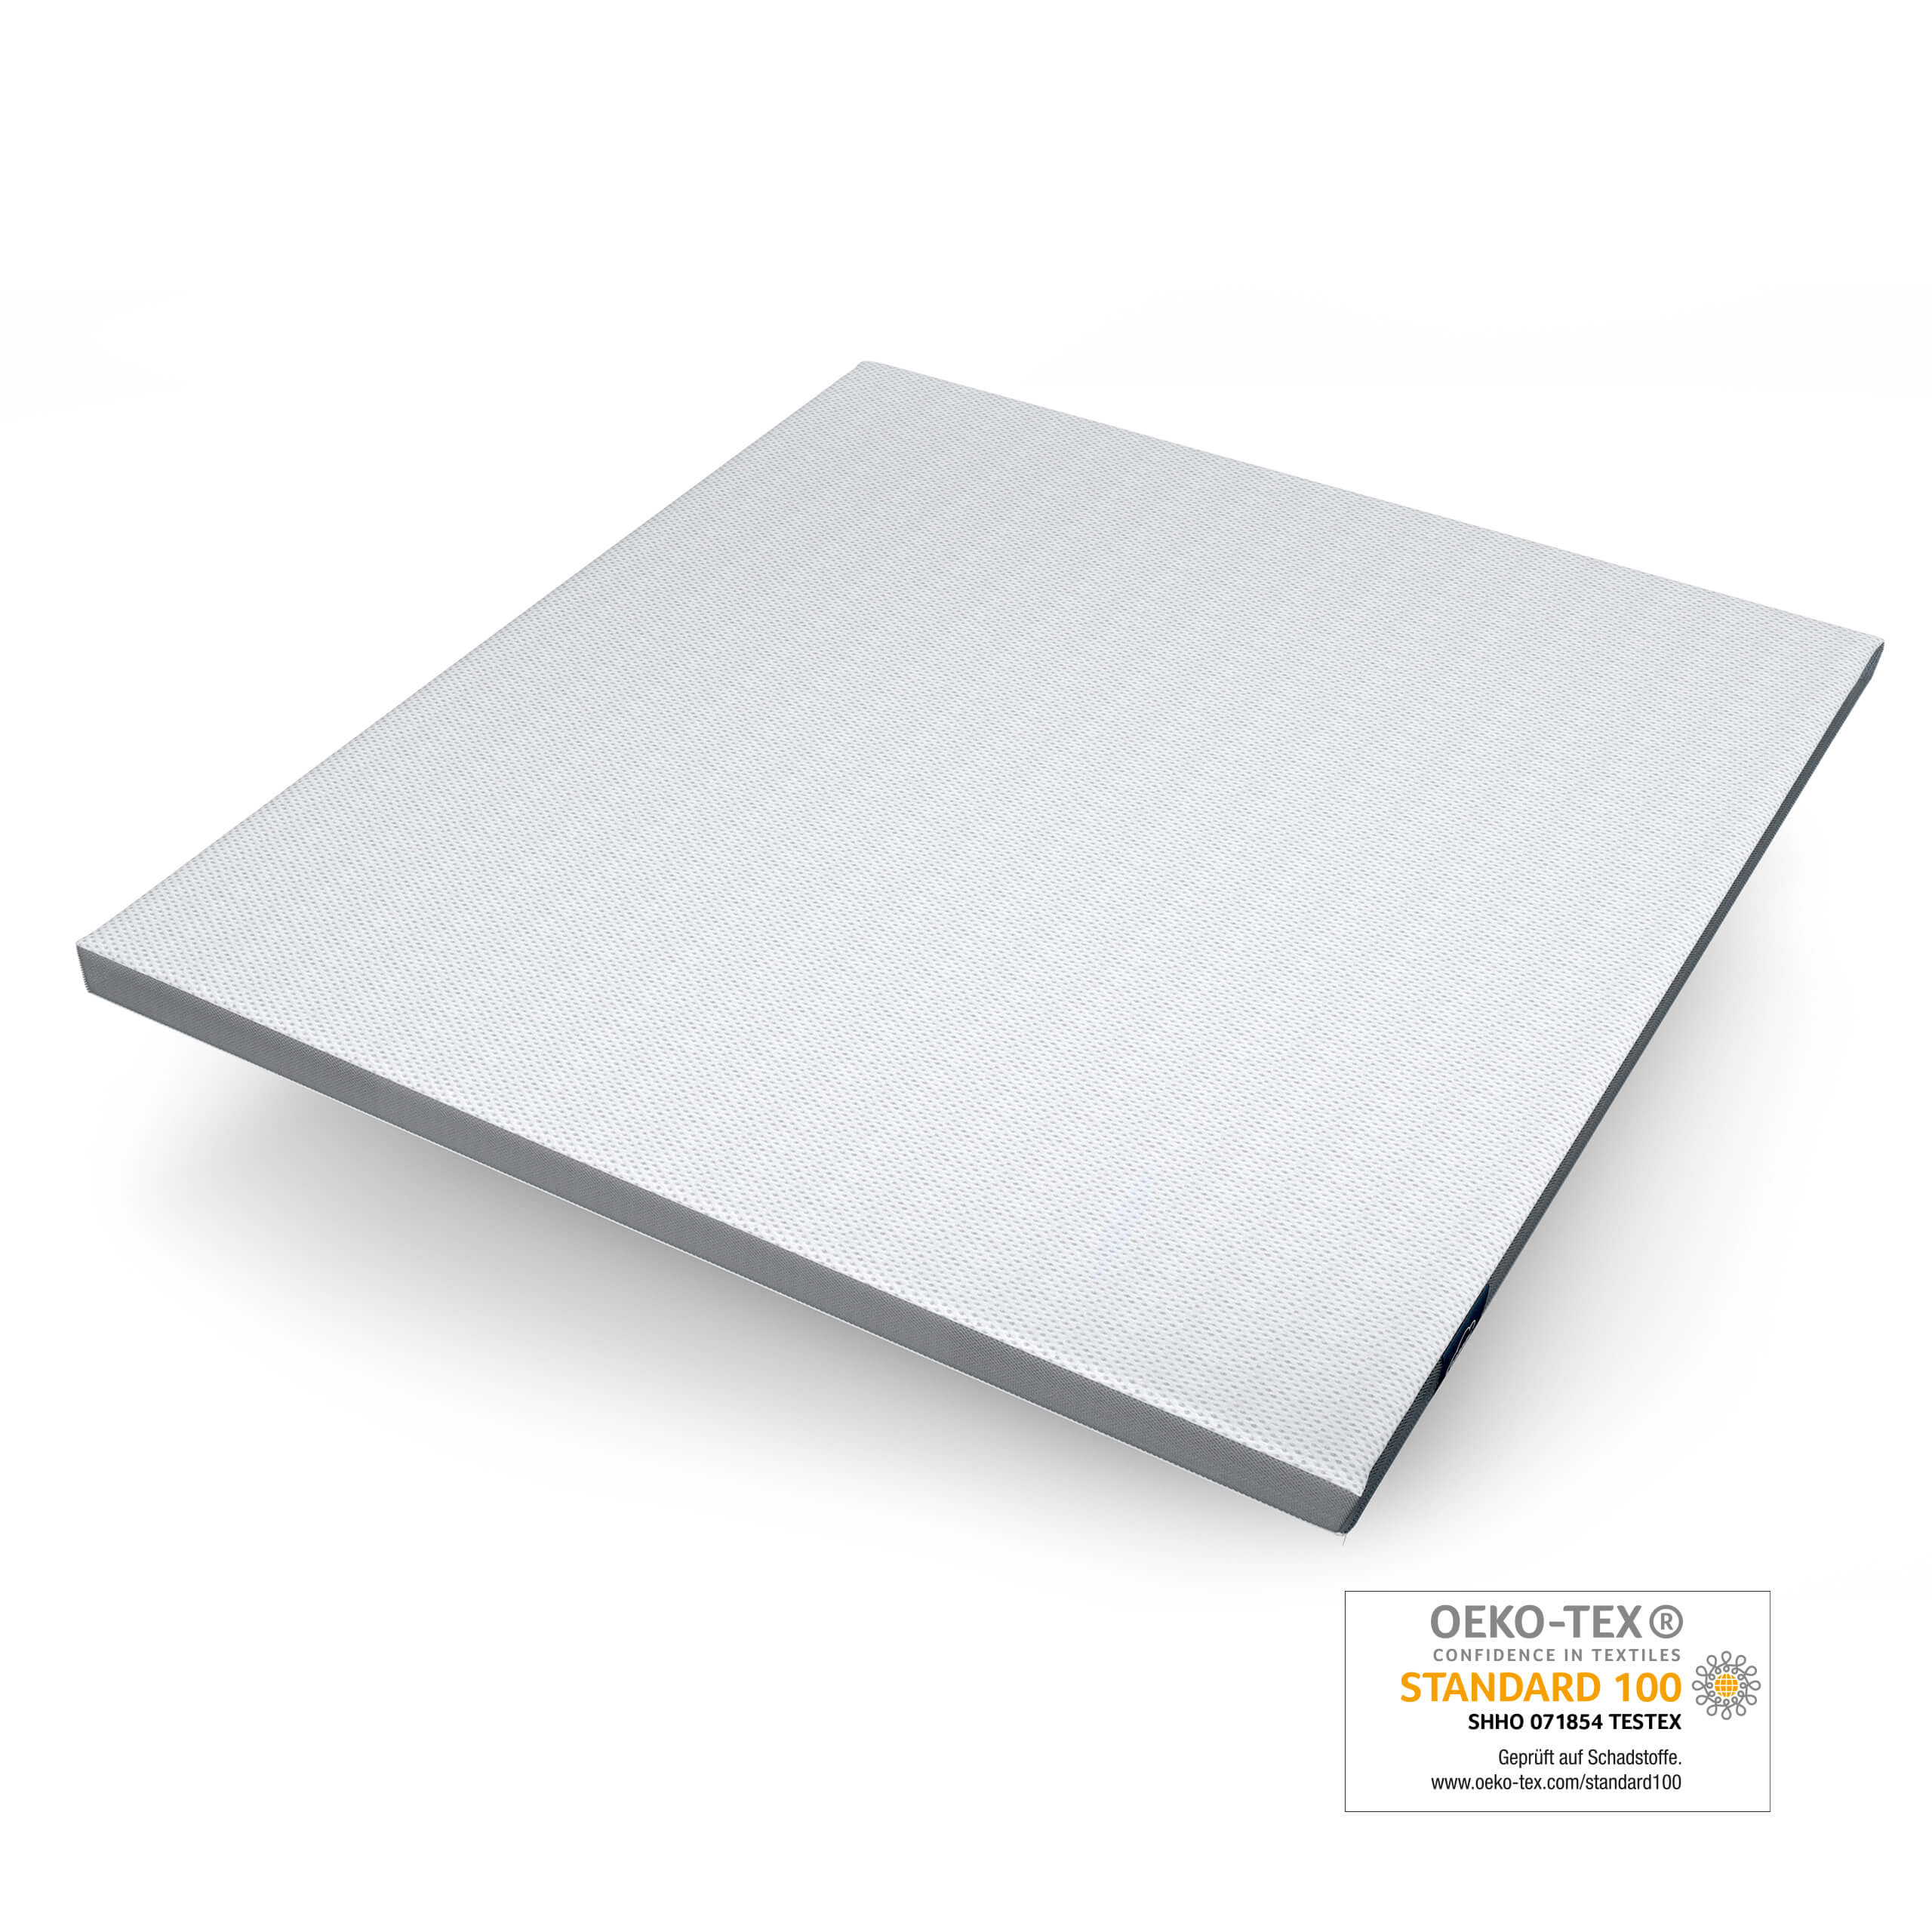 Genius eazzzy | Matratzentopper 200 x 220 x 7 cm A19302